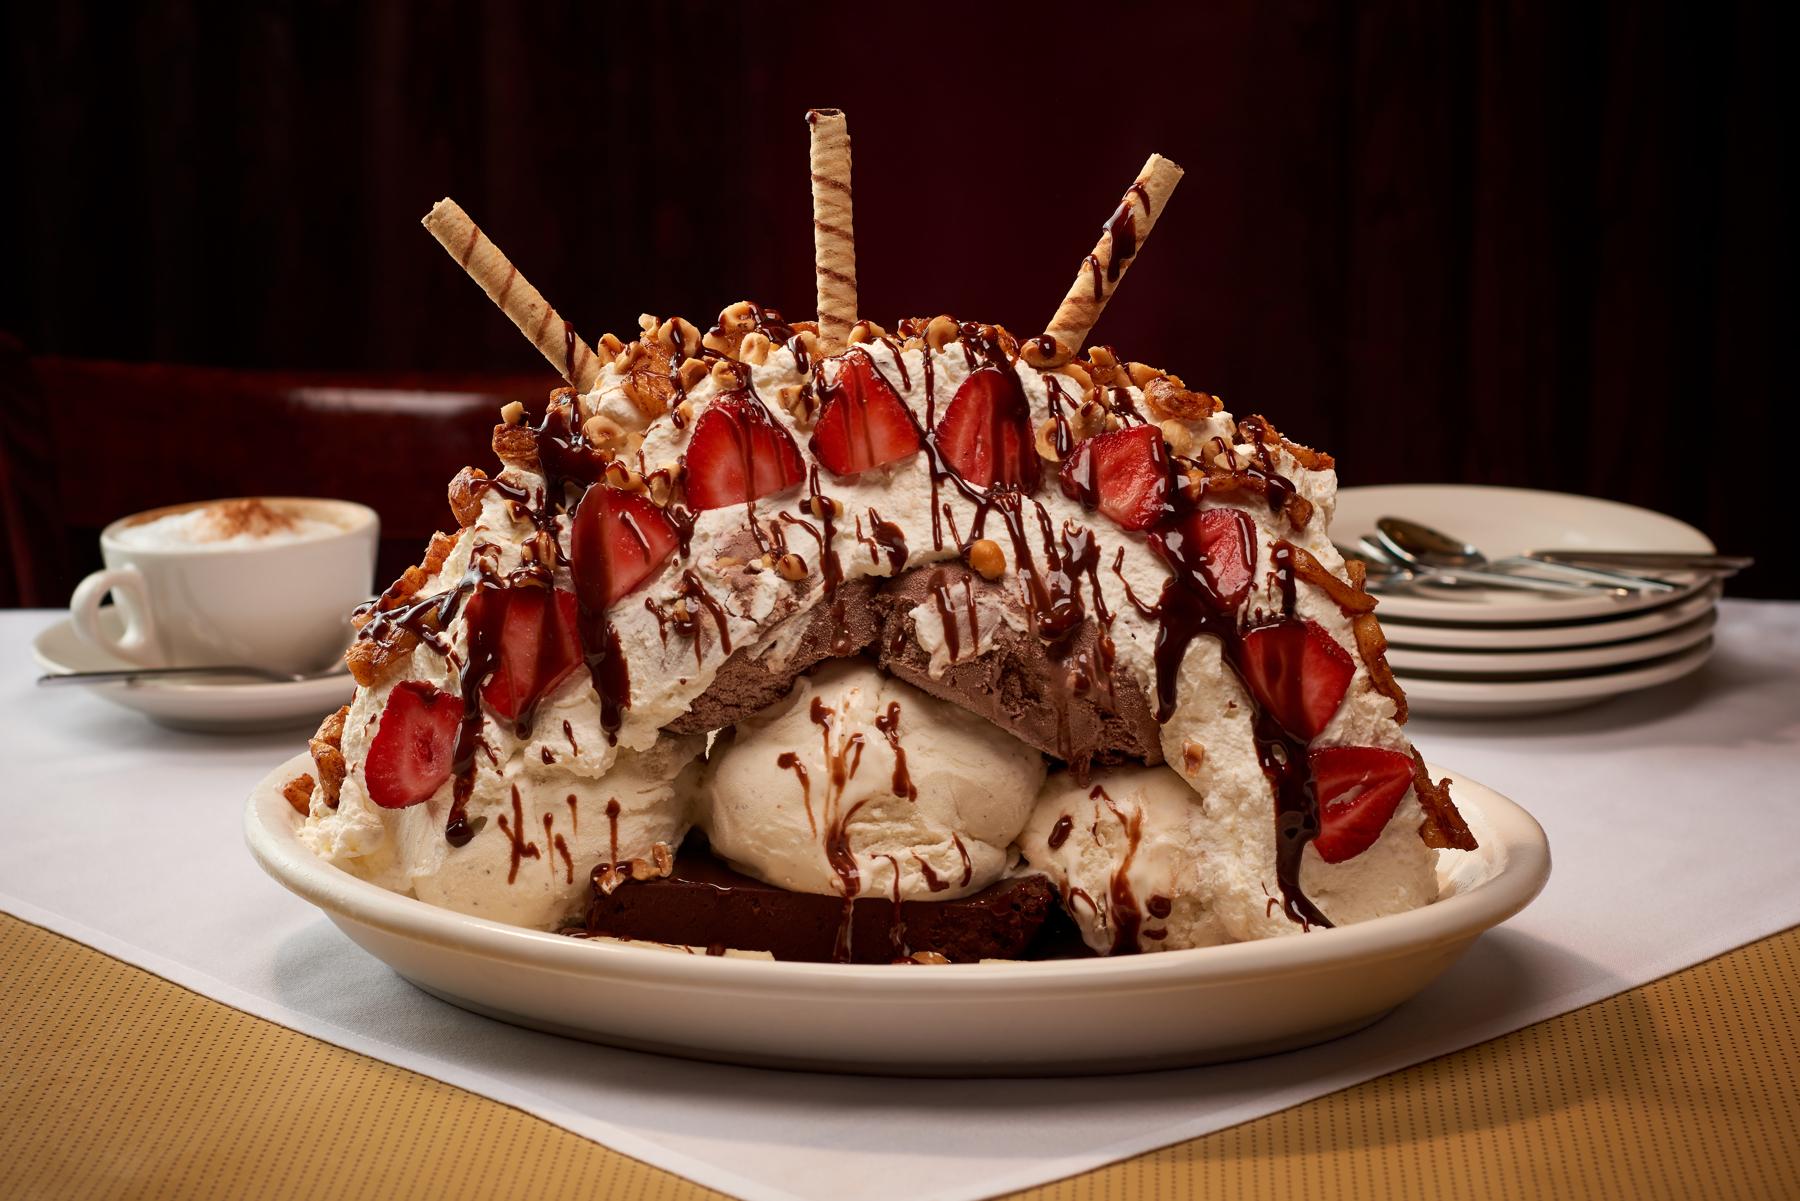 Carmine's dessert